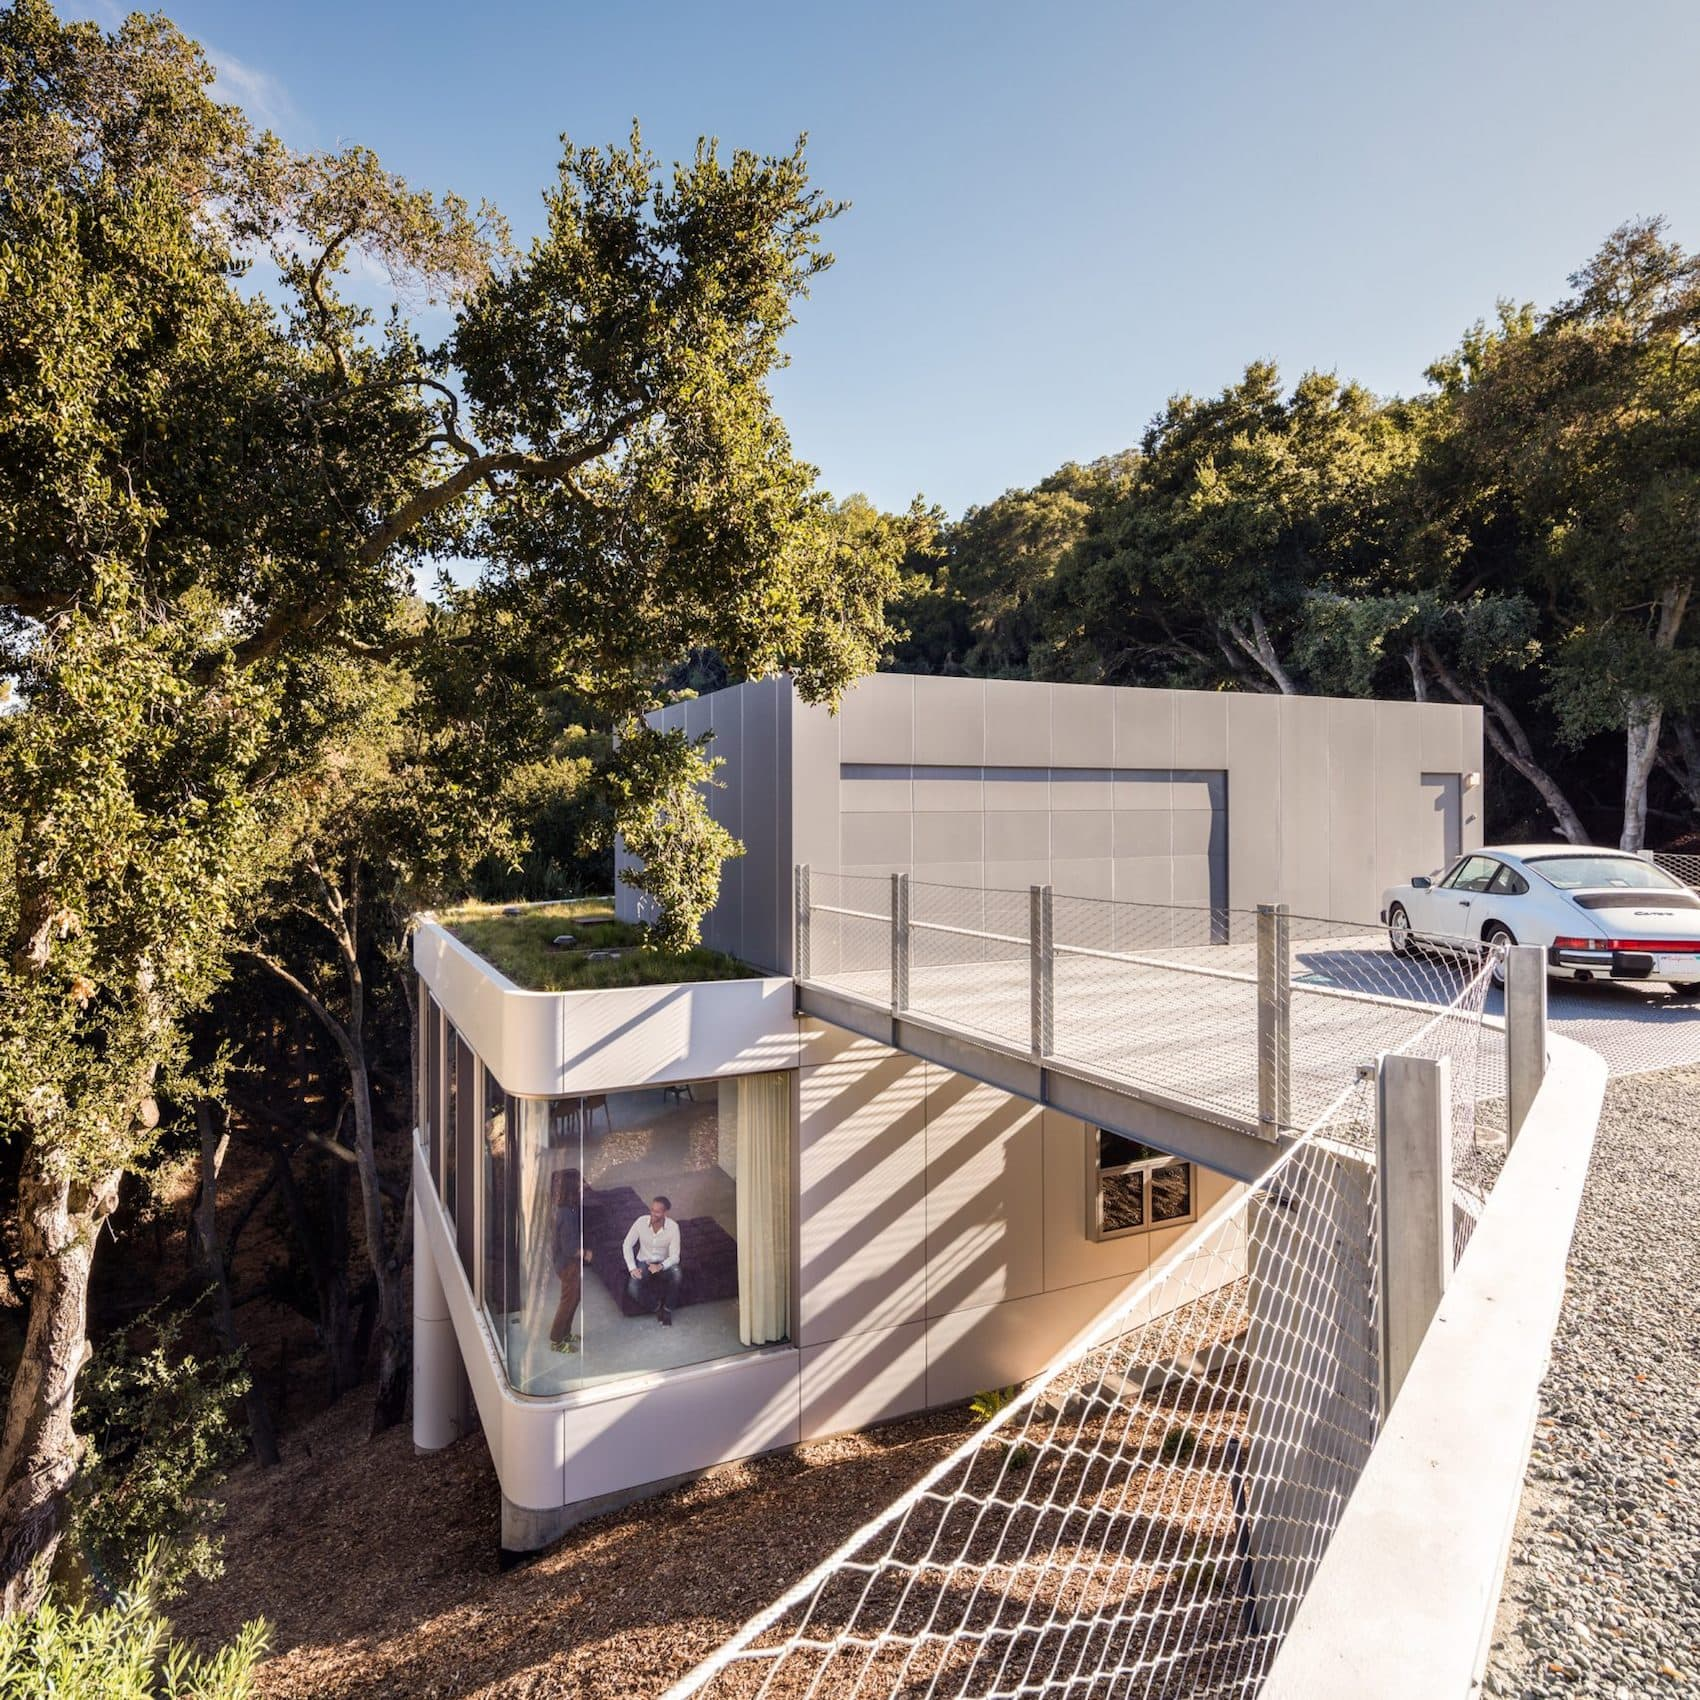 Licht ist Leben: Pam & Paul's House by Craig Steely Architecture 3